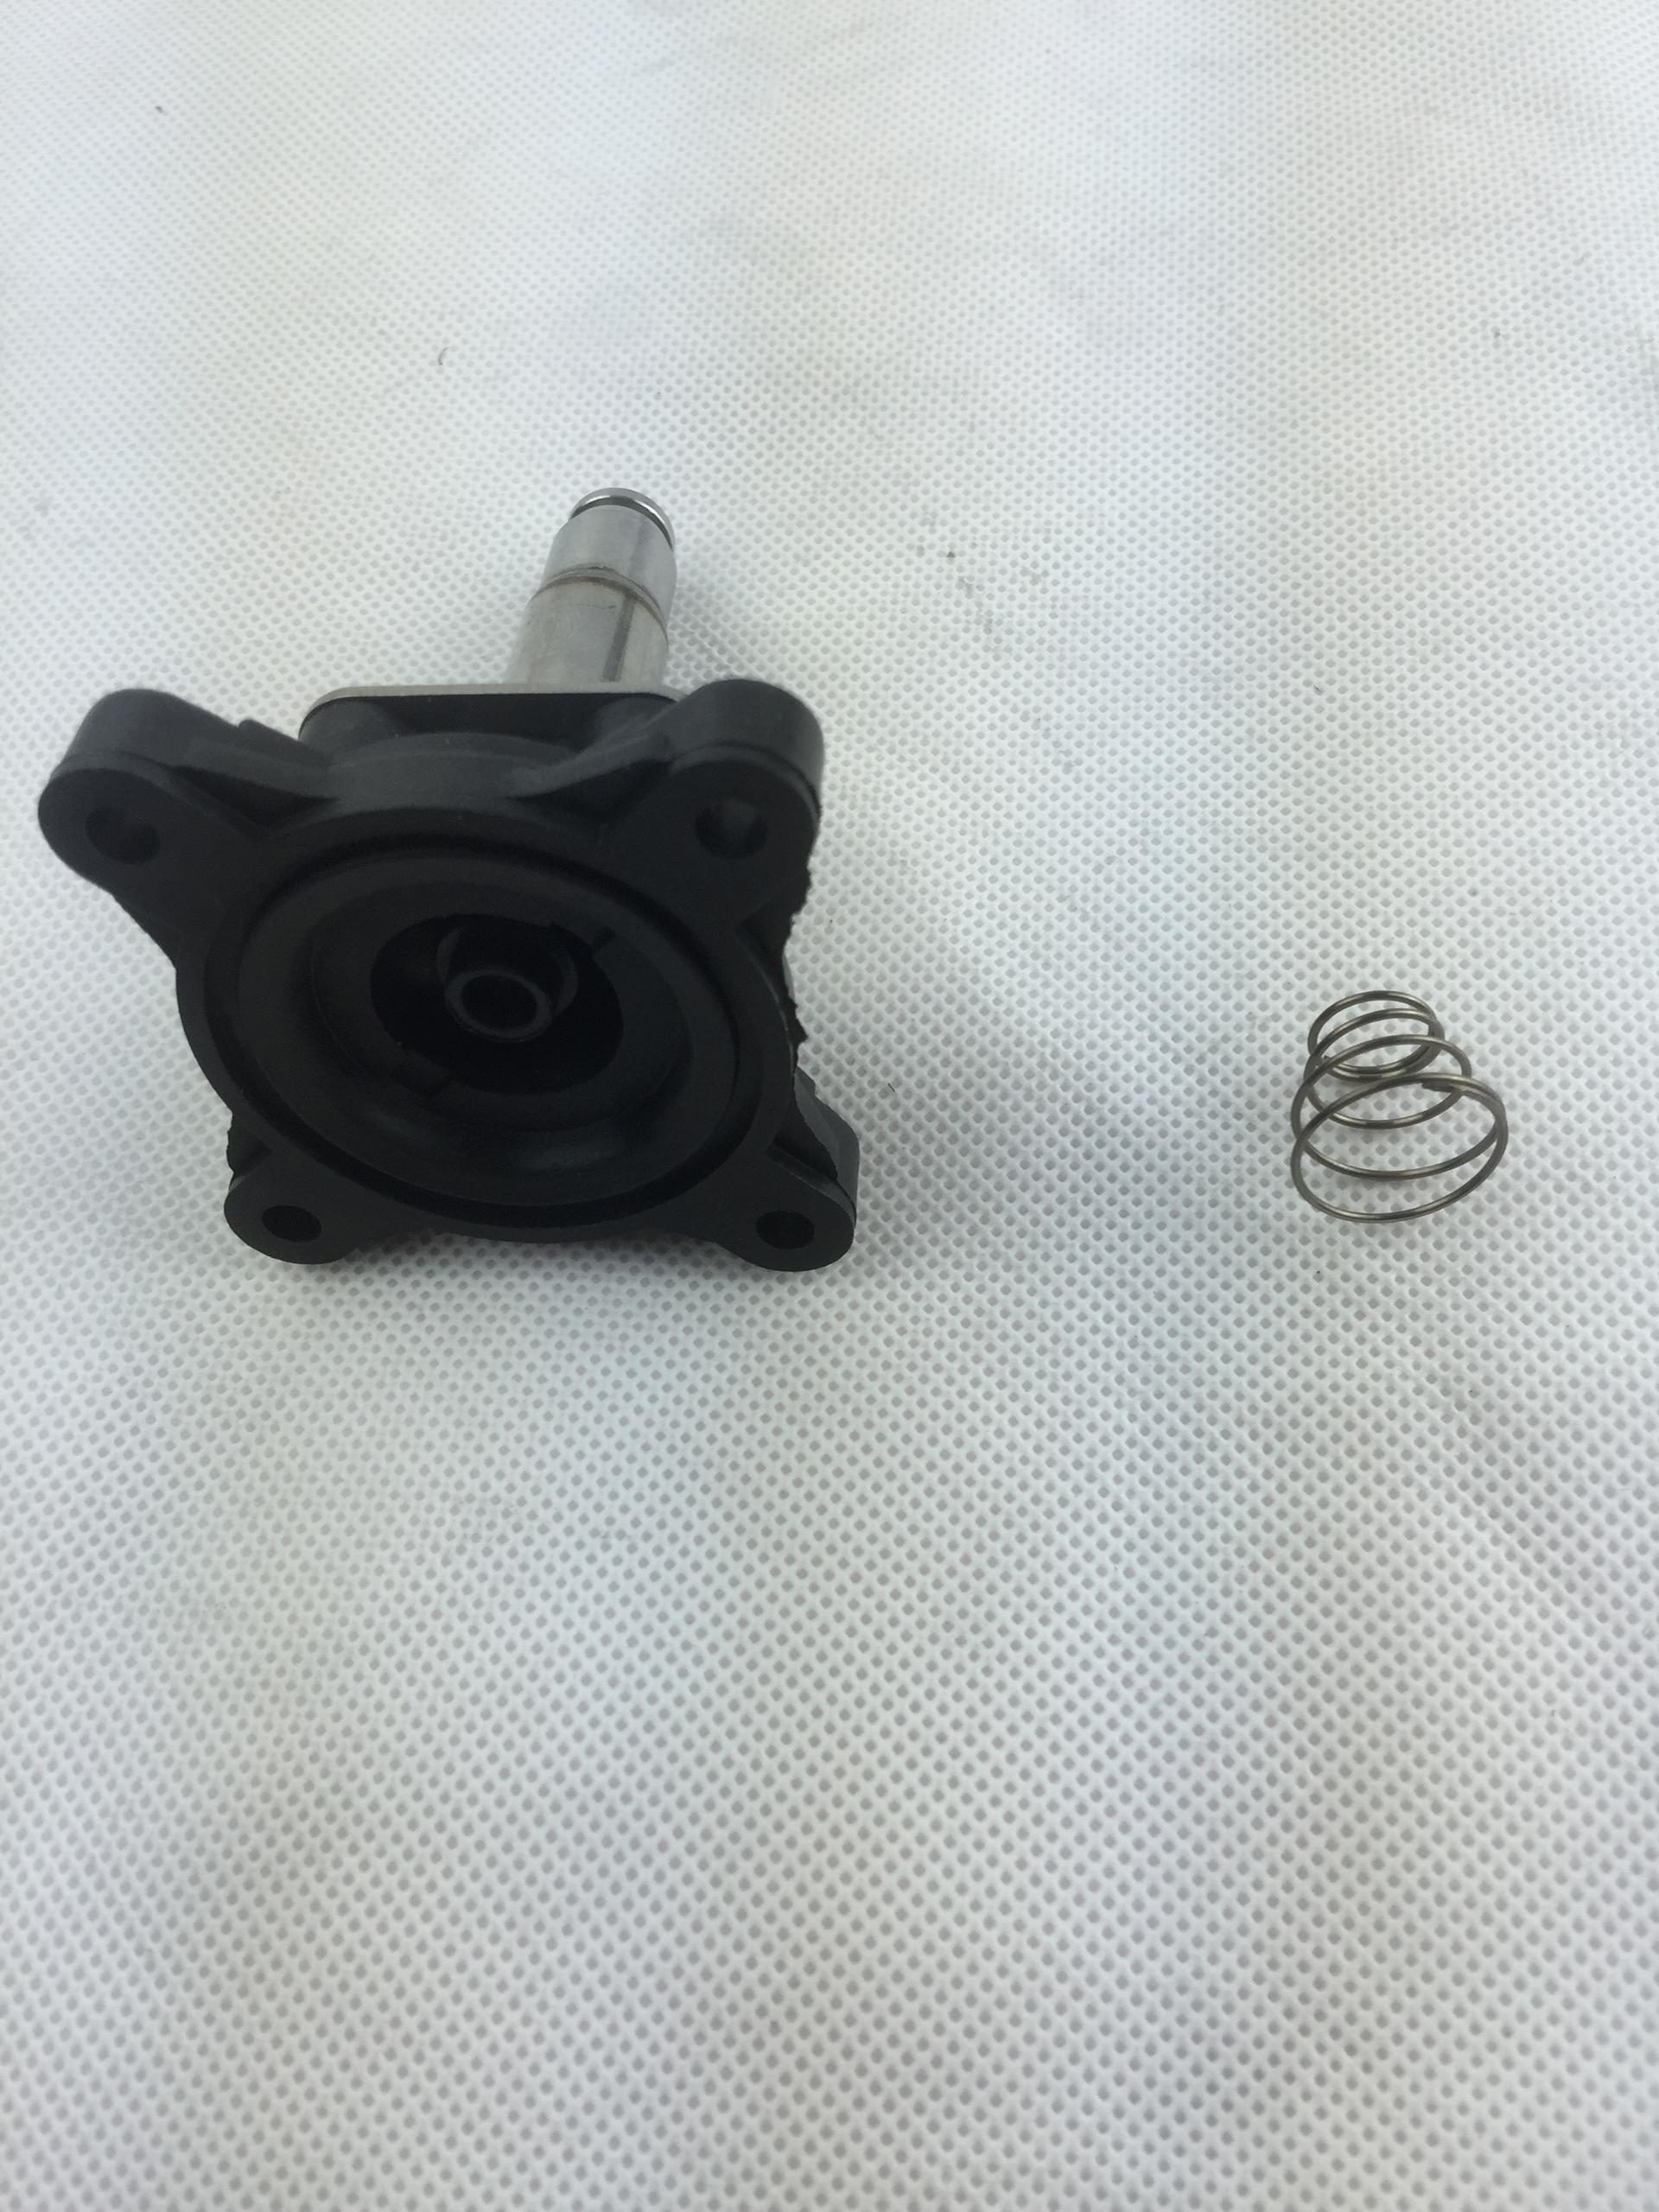 Armature Pulse jet valve Environment-friendly Stainless Steel Plunger Pulse Valve